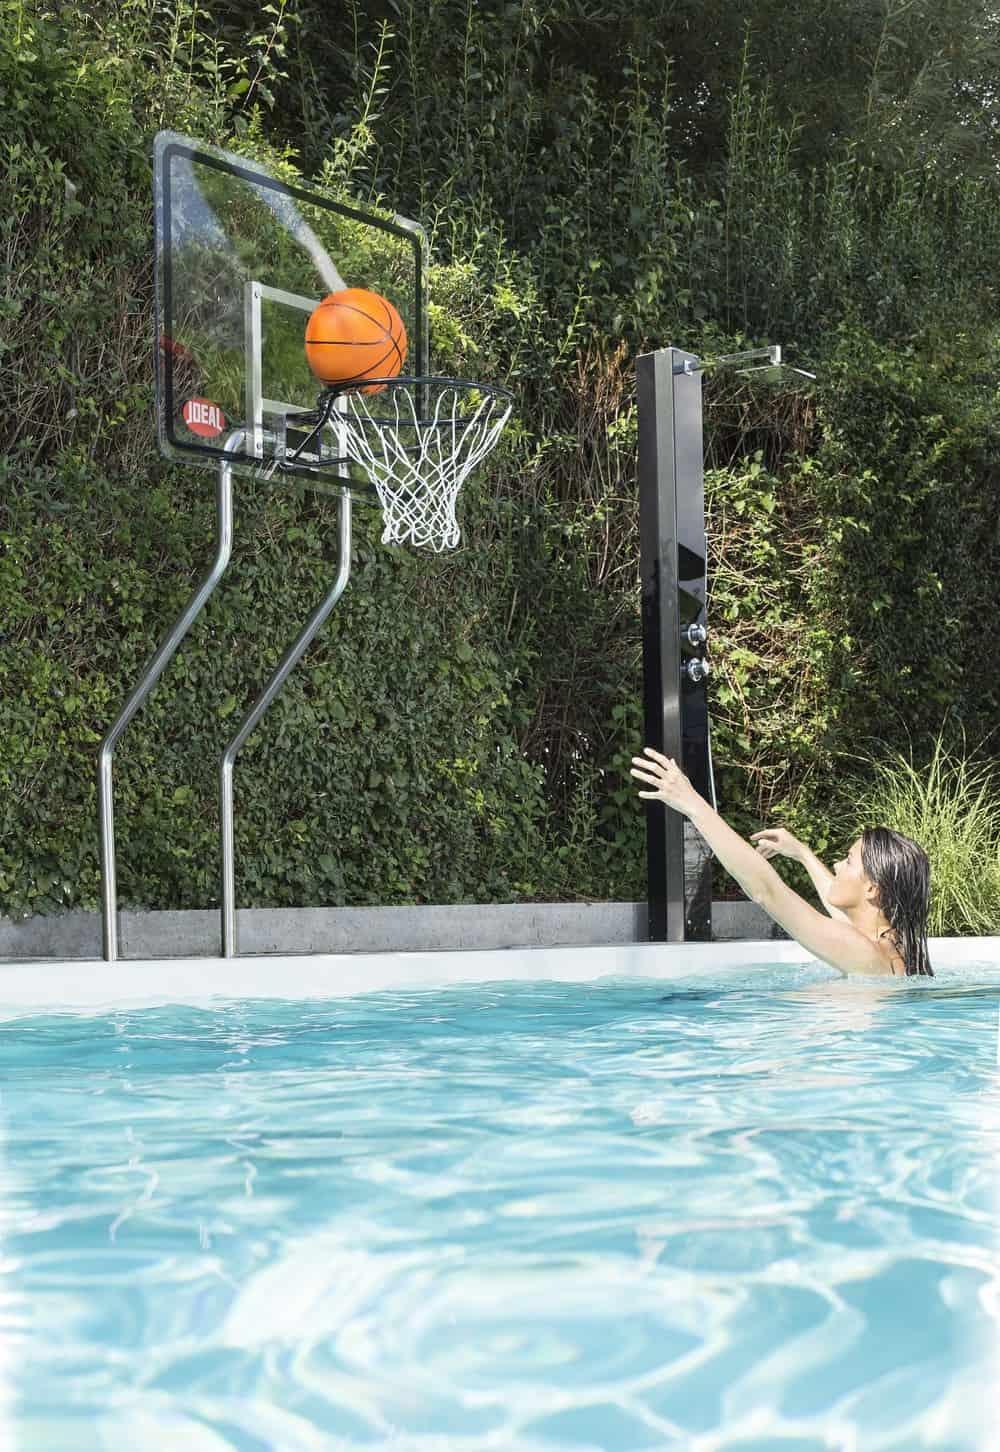 profi basketballkorb sorgt f r mehr spa im eigenen swimmingpool baufux netzwerk. Black Bedroom Furniture Sets. Home Design Ideas